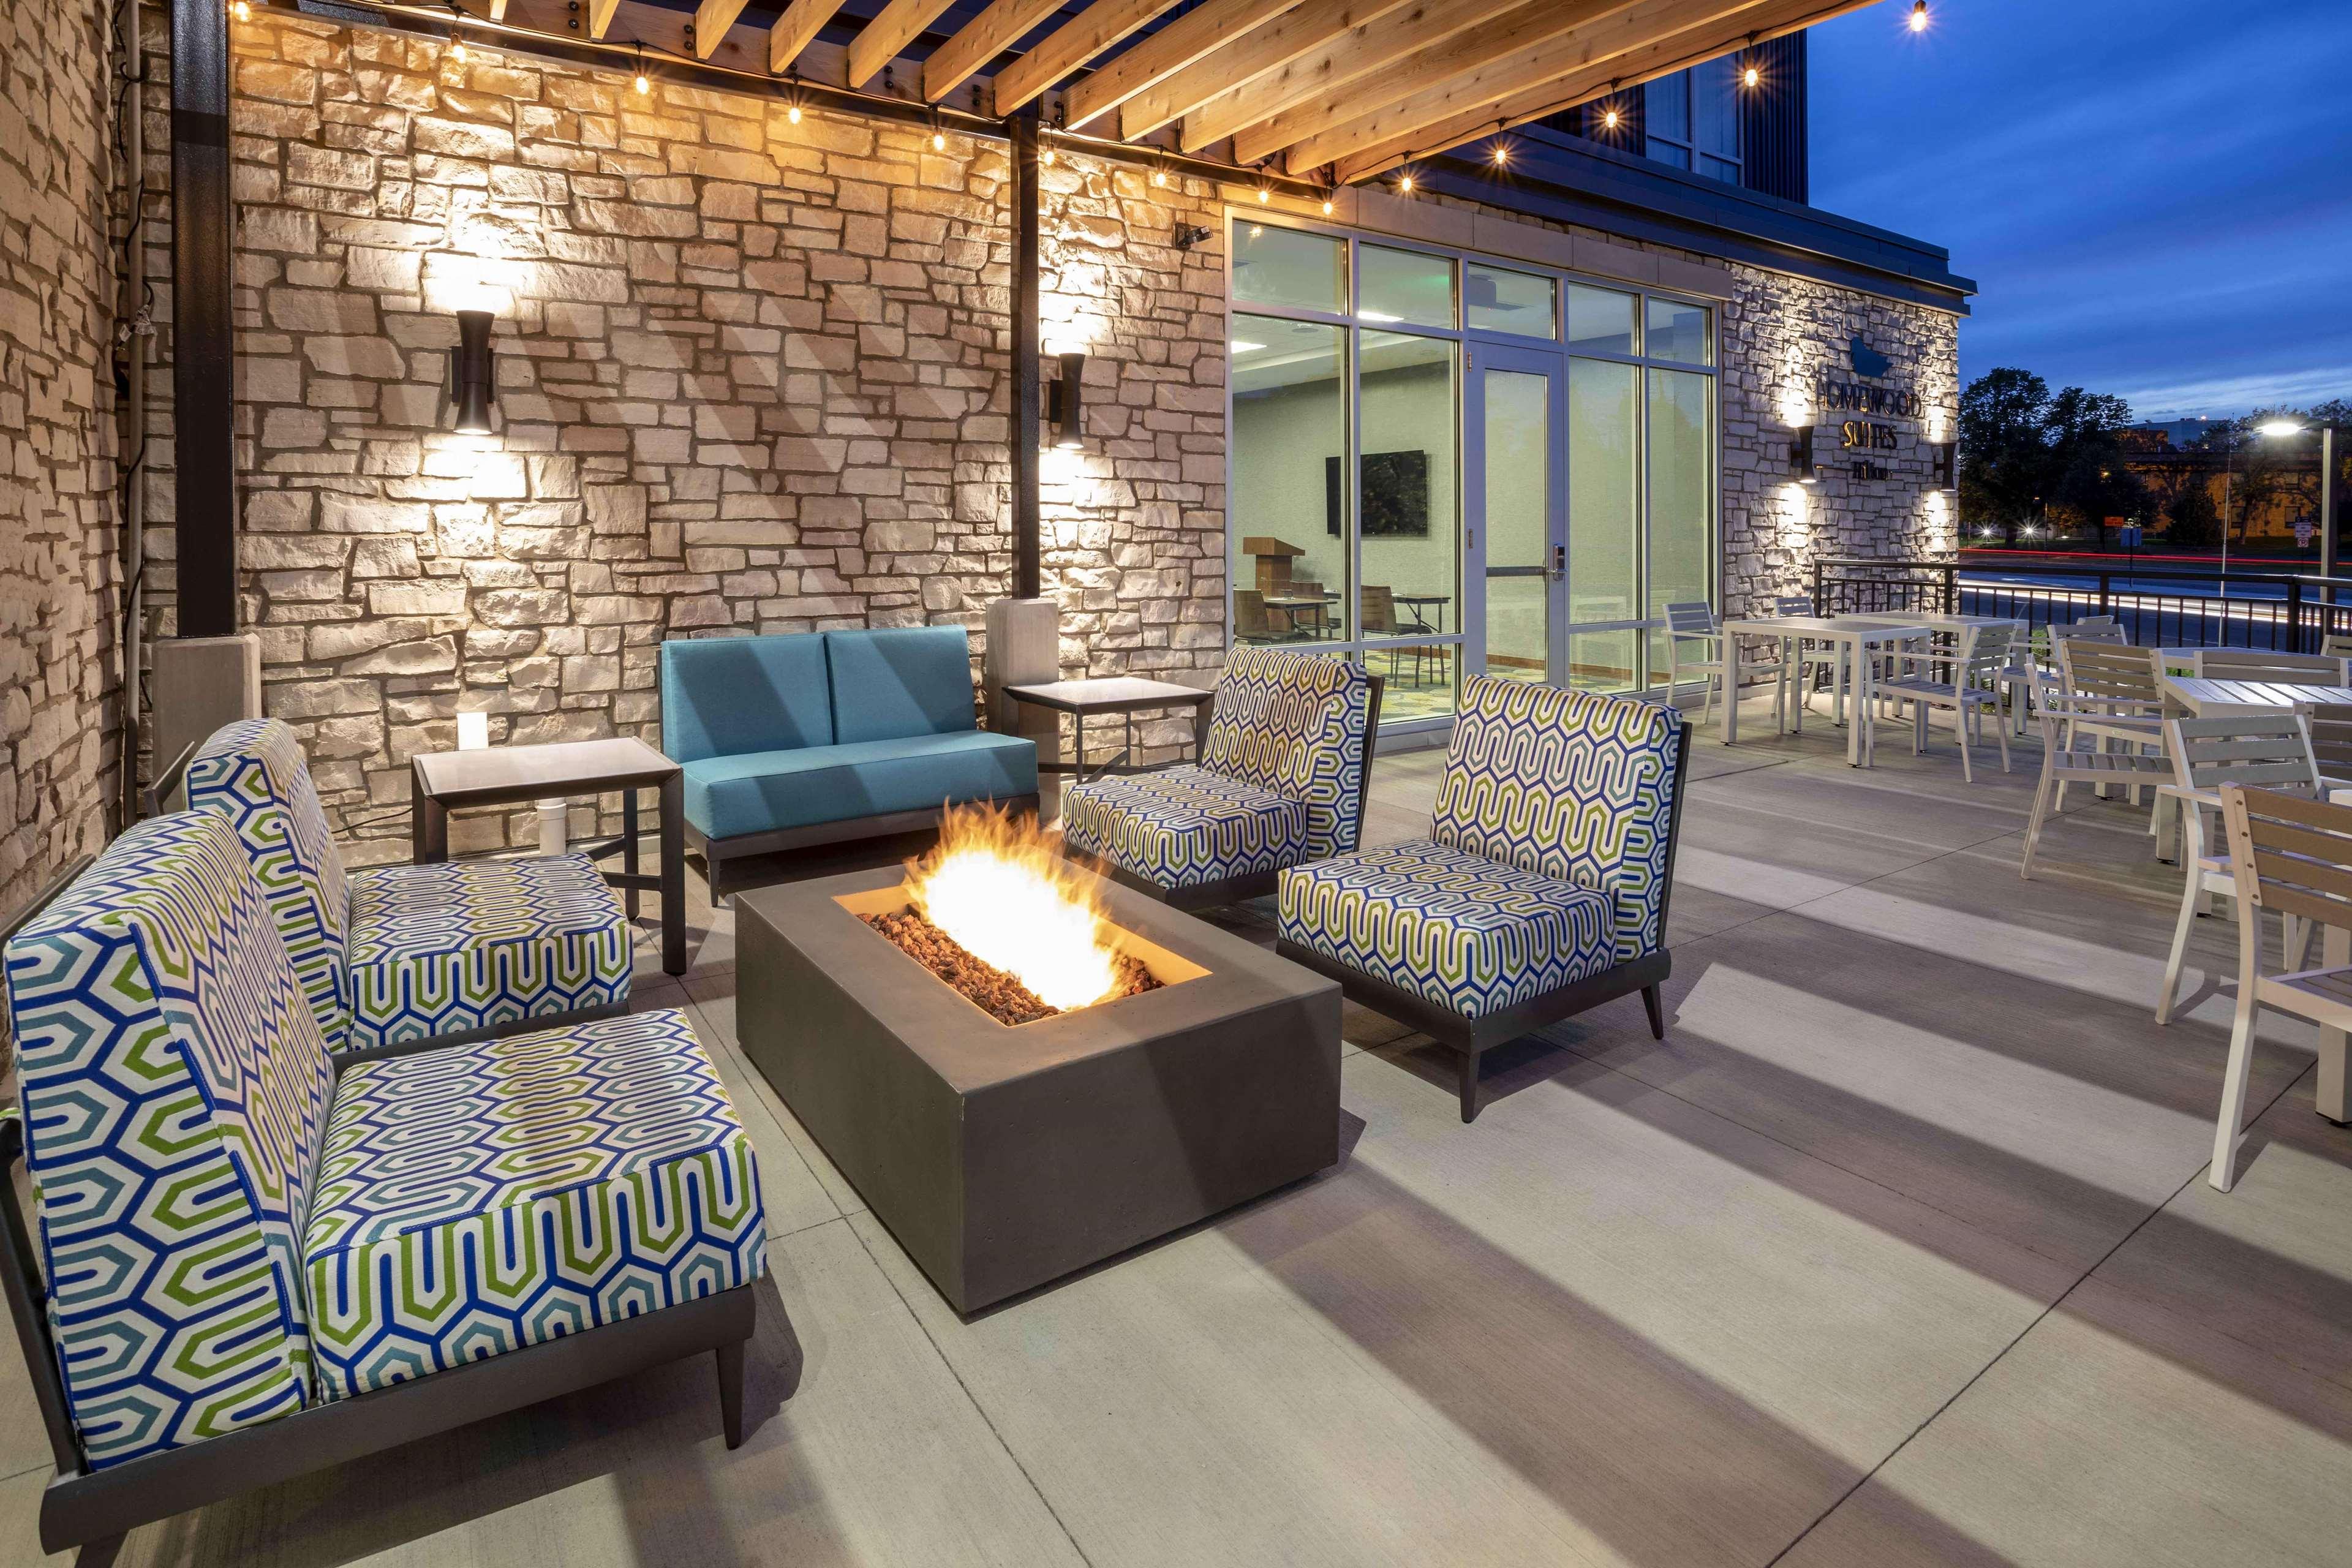 Homewood Suites by Hilton Edina Minneapolis image 5